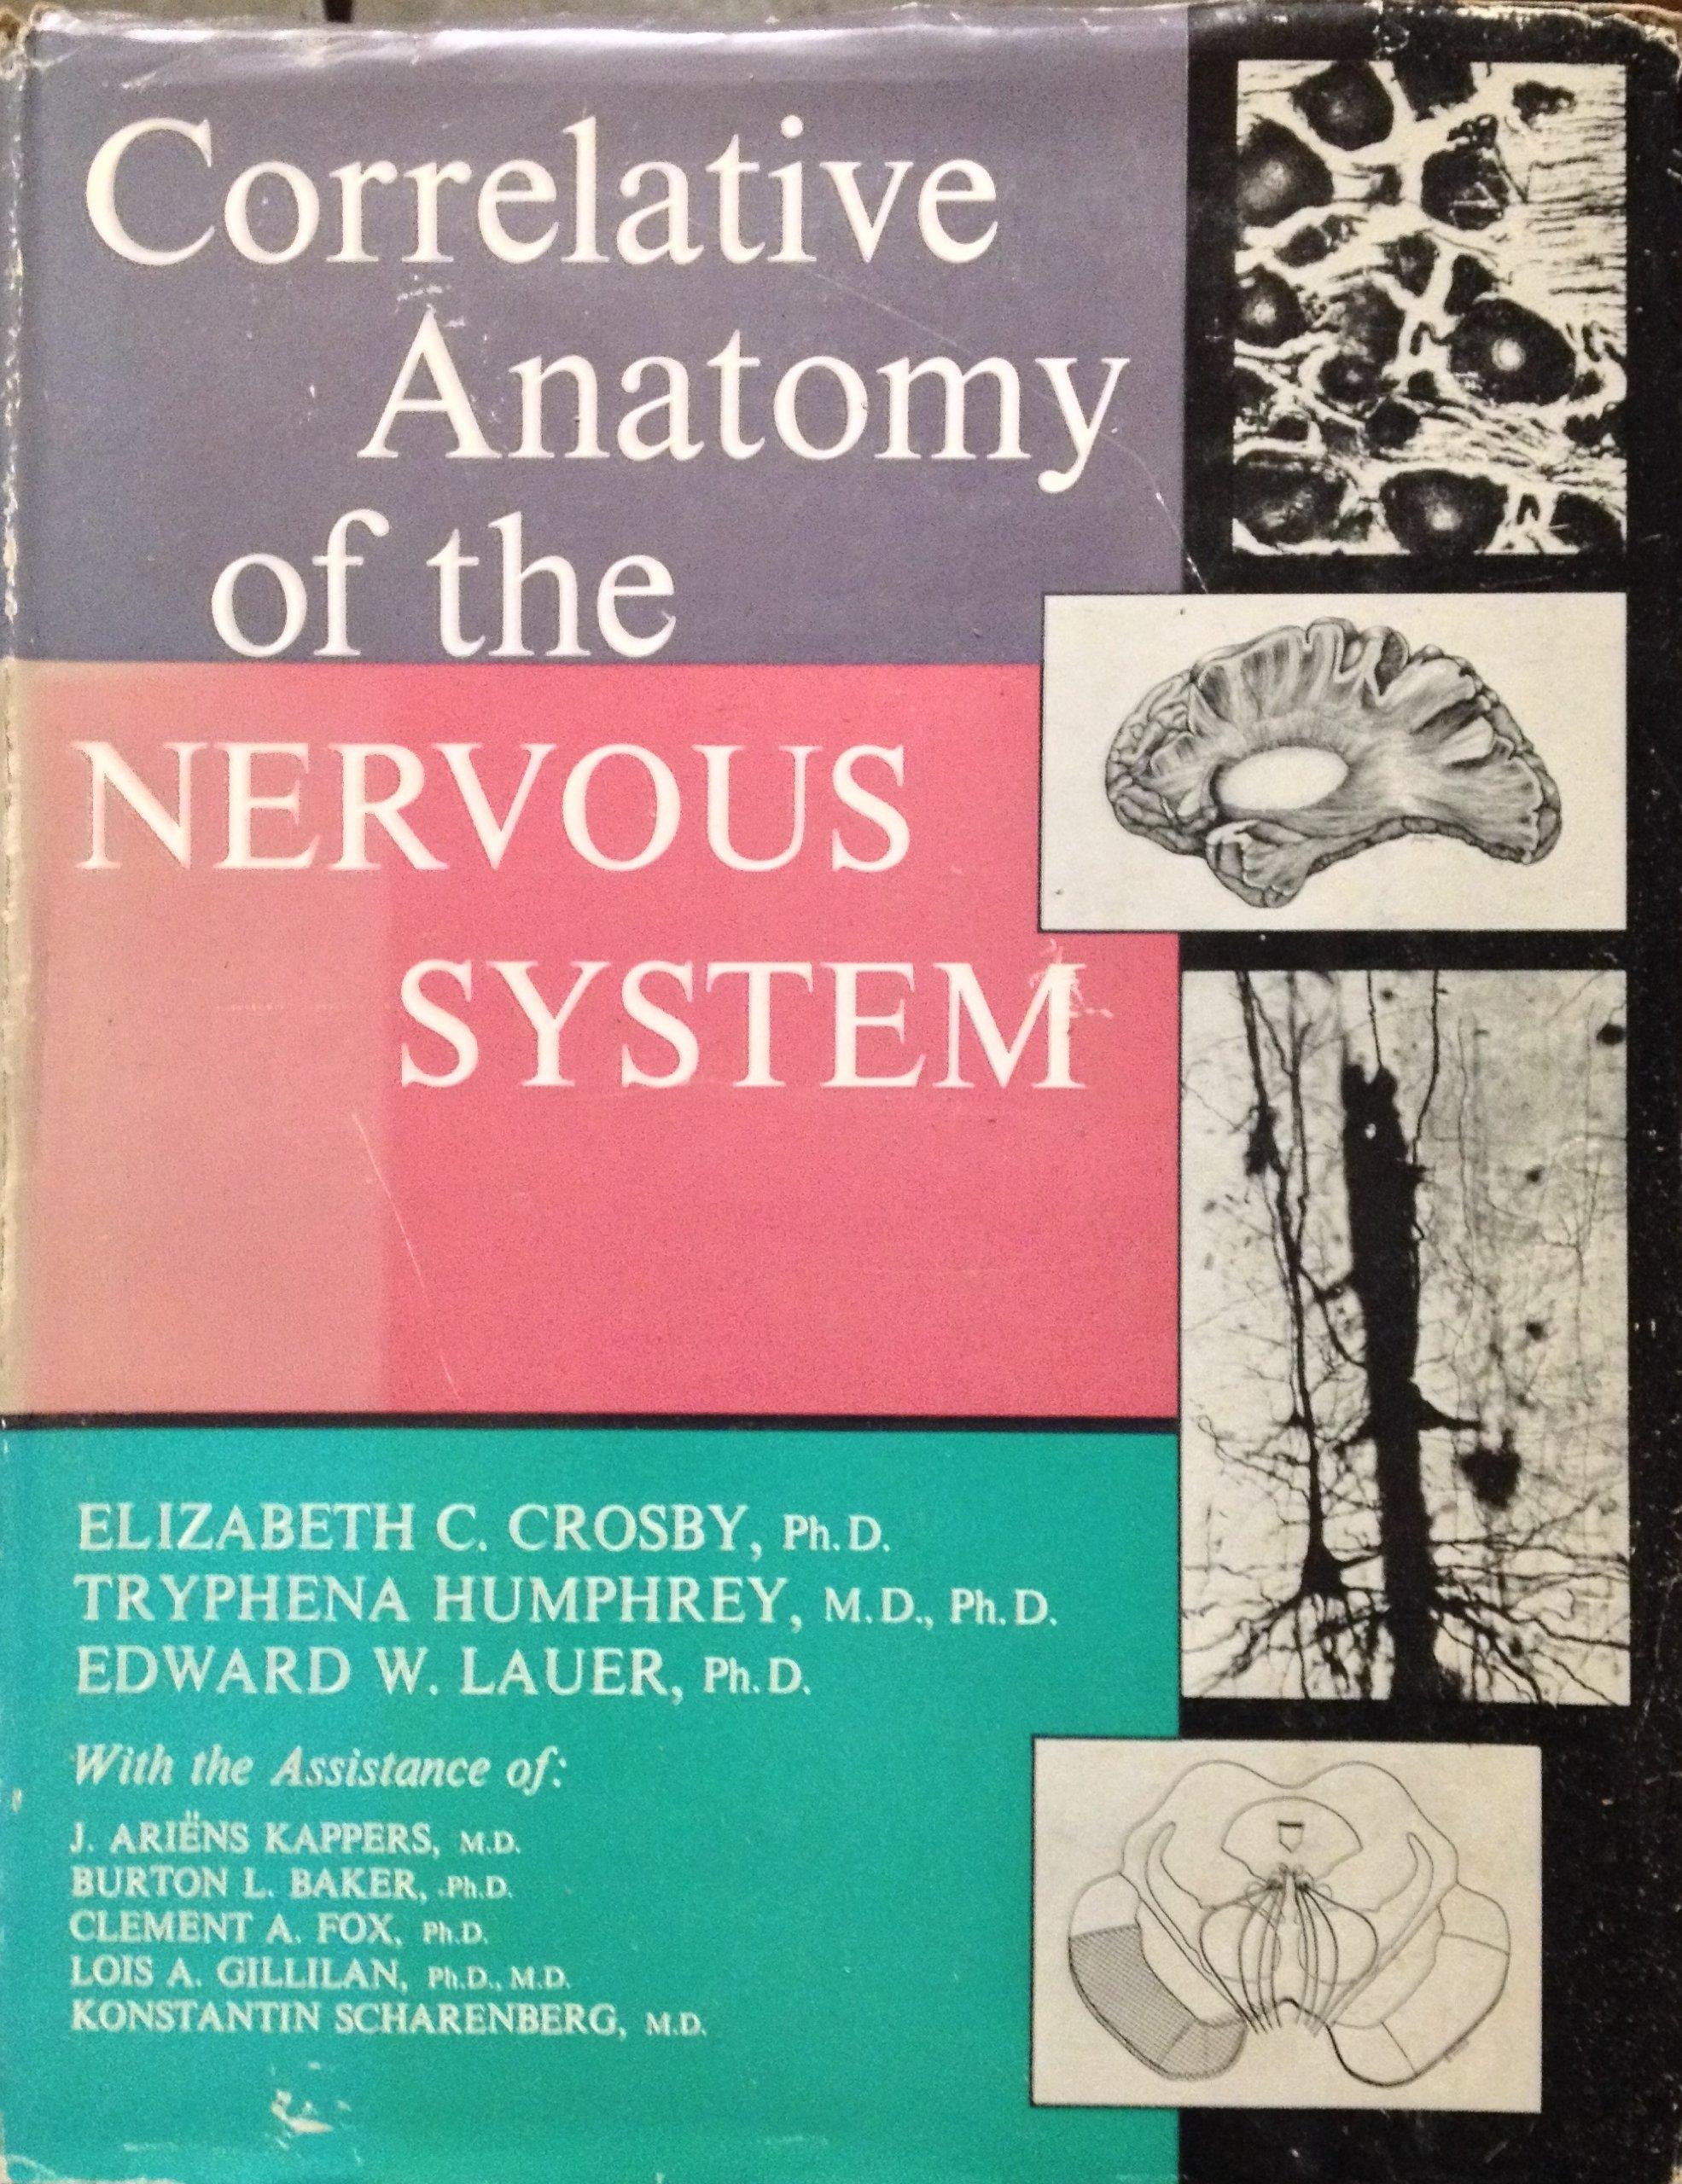 Correlative Anatomy of the Nervous System: Elizabeth C. Crosby ...